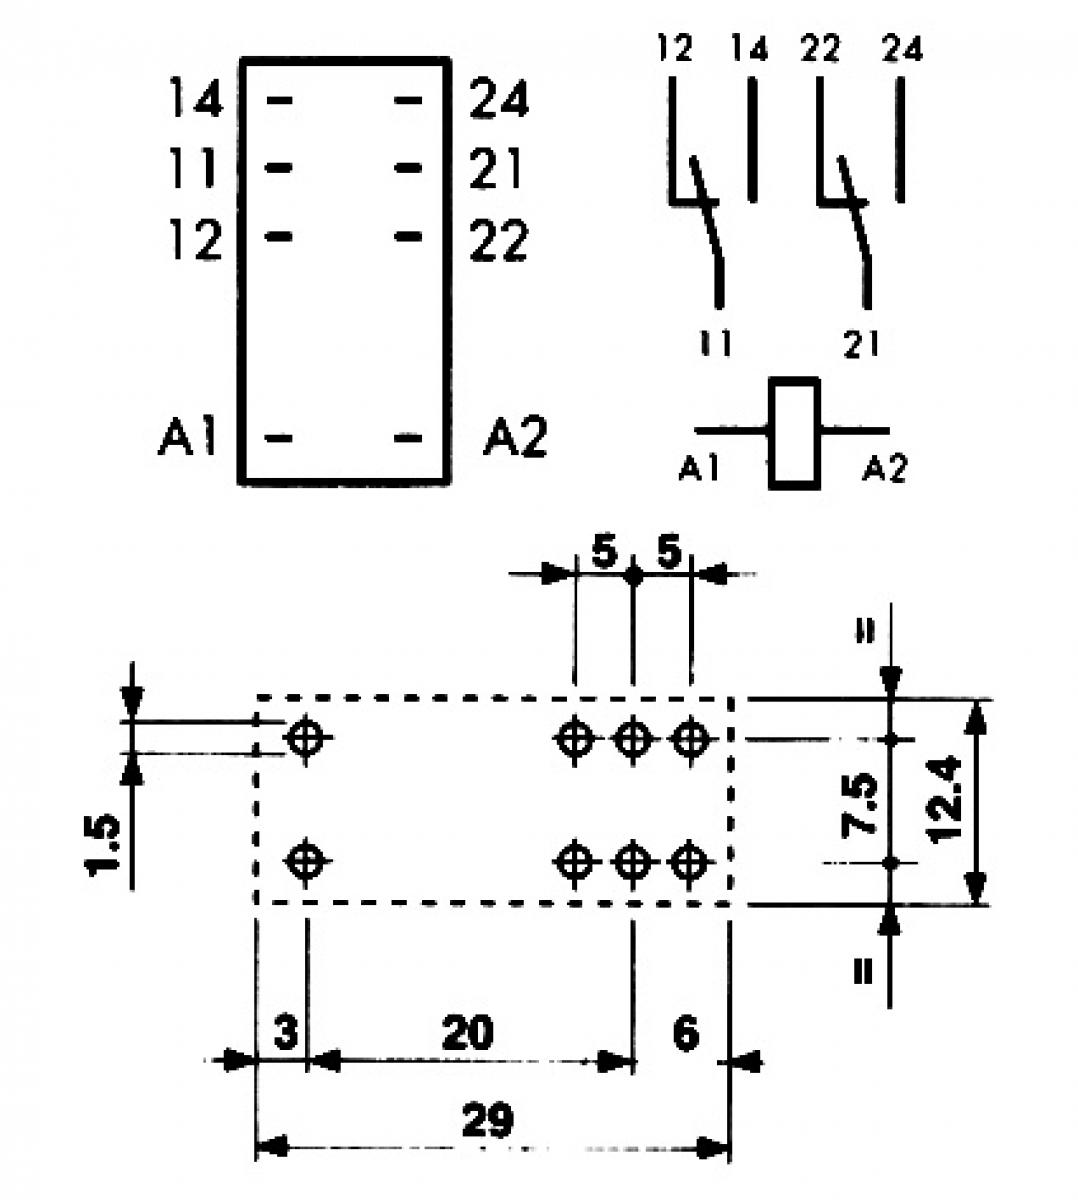 finder relais 24v dc max 8a 2x wechselkontakt l deke elektronic